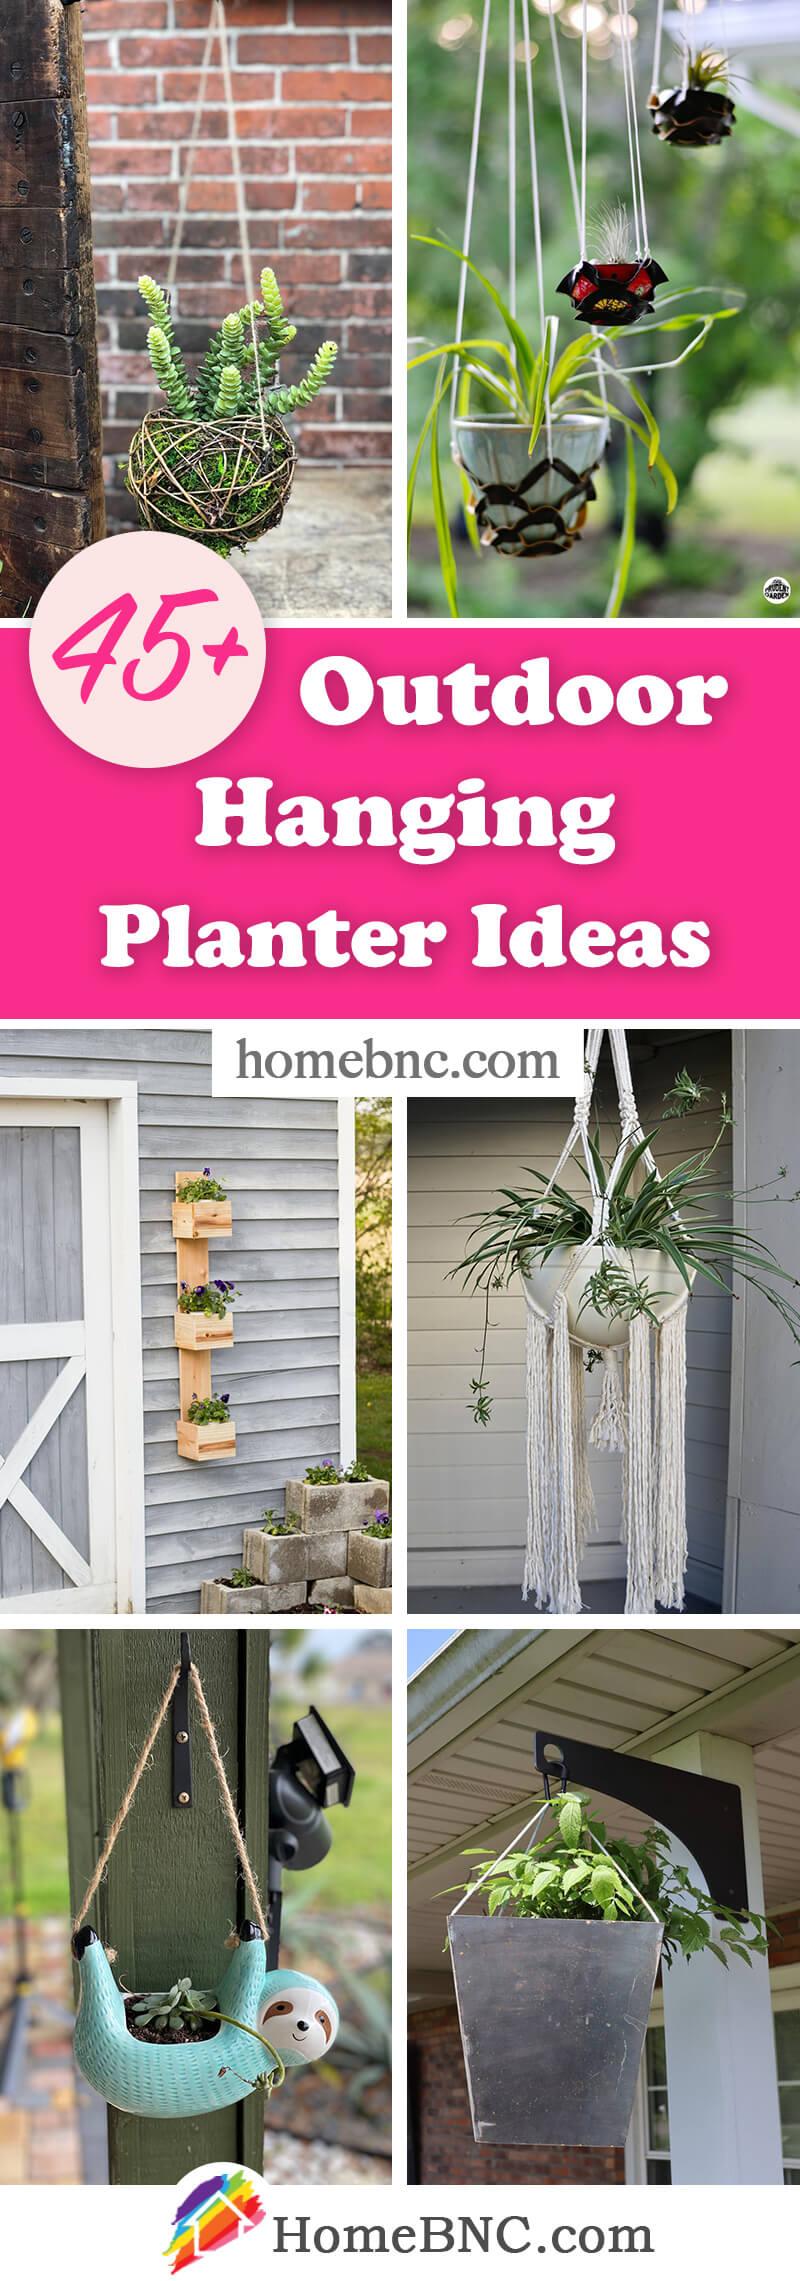 Outdoor Hanging Planters